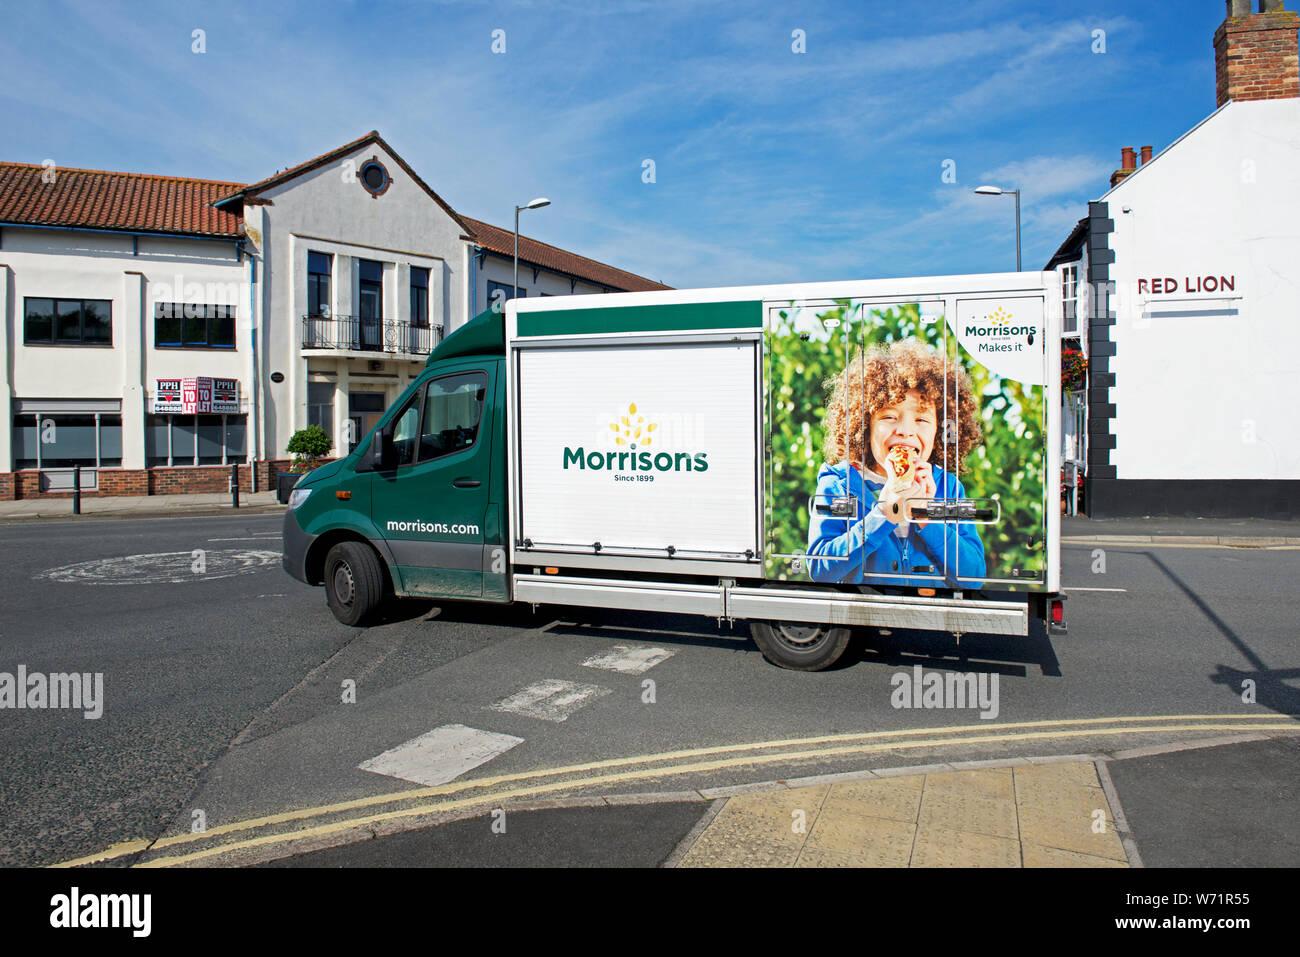 morrisons-delivery-van-in-market-weighton-east-yorkshire-england-uk-W71R55.jpg